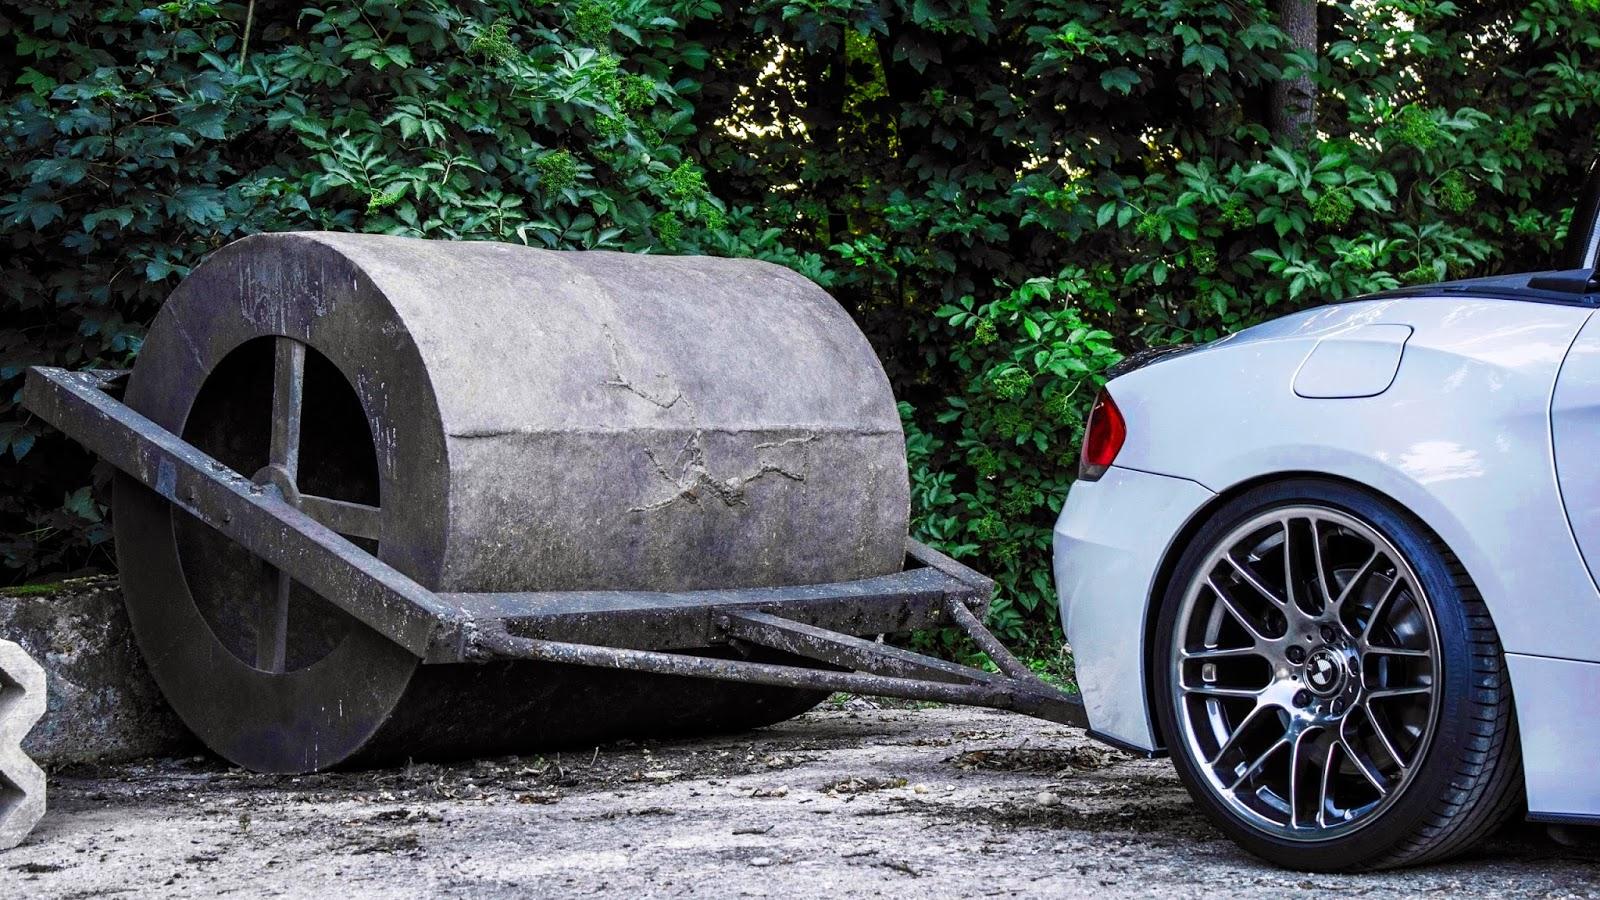 Mb Bmw Z4 E89 Carbon Fiber Body Kit 2013 Aro 19 Carwp